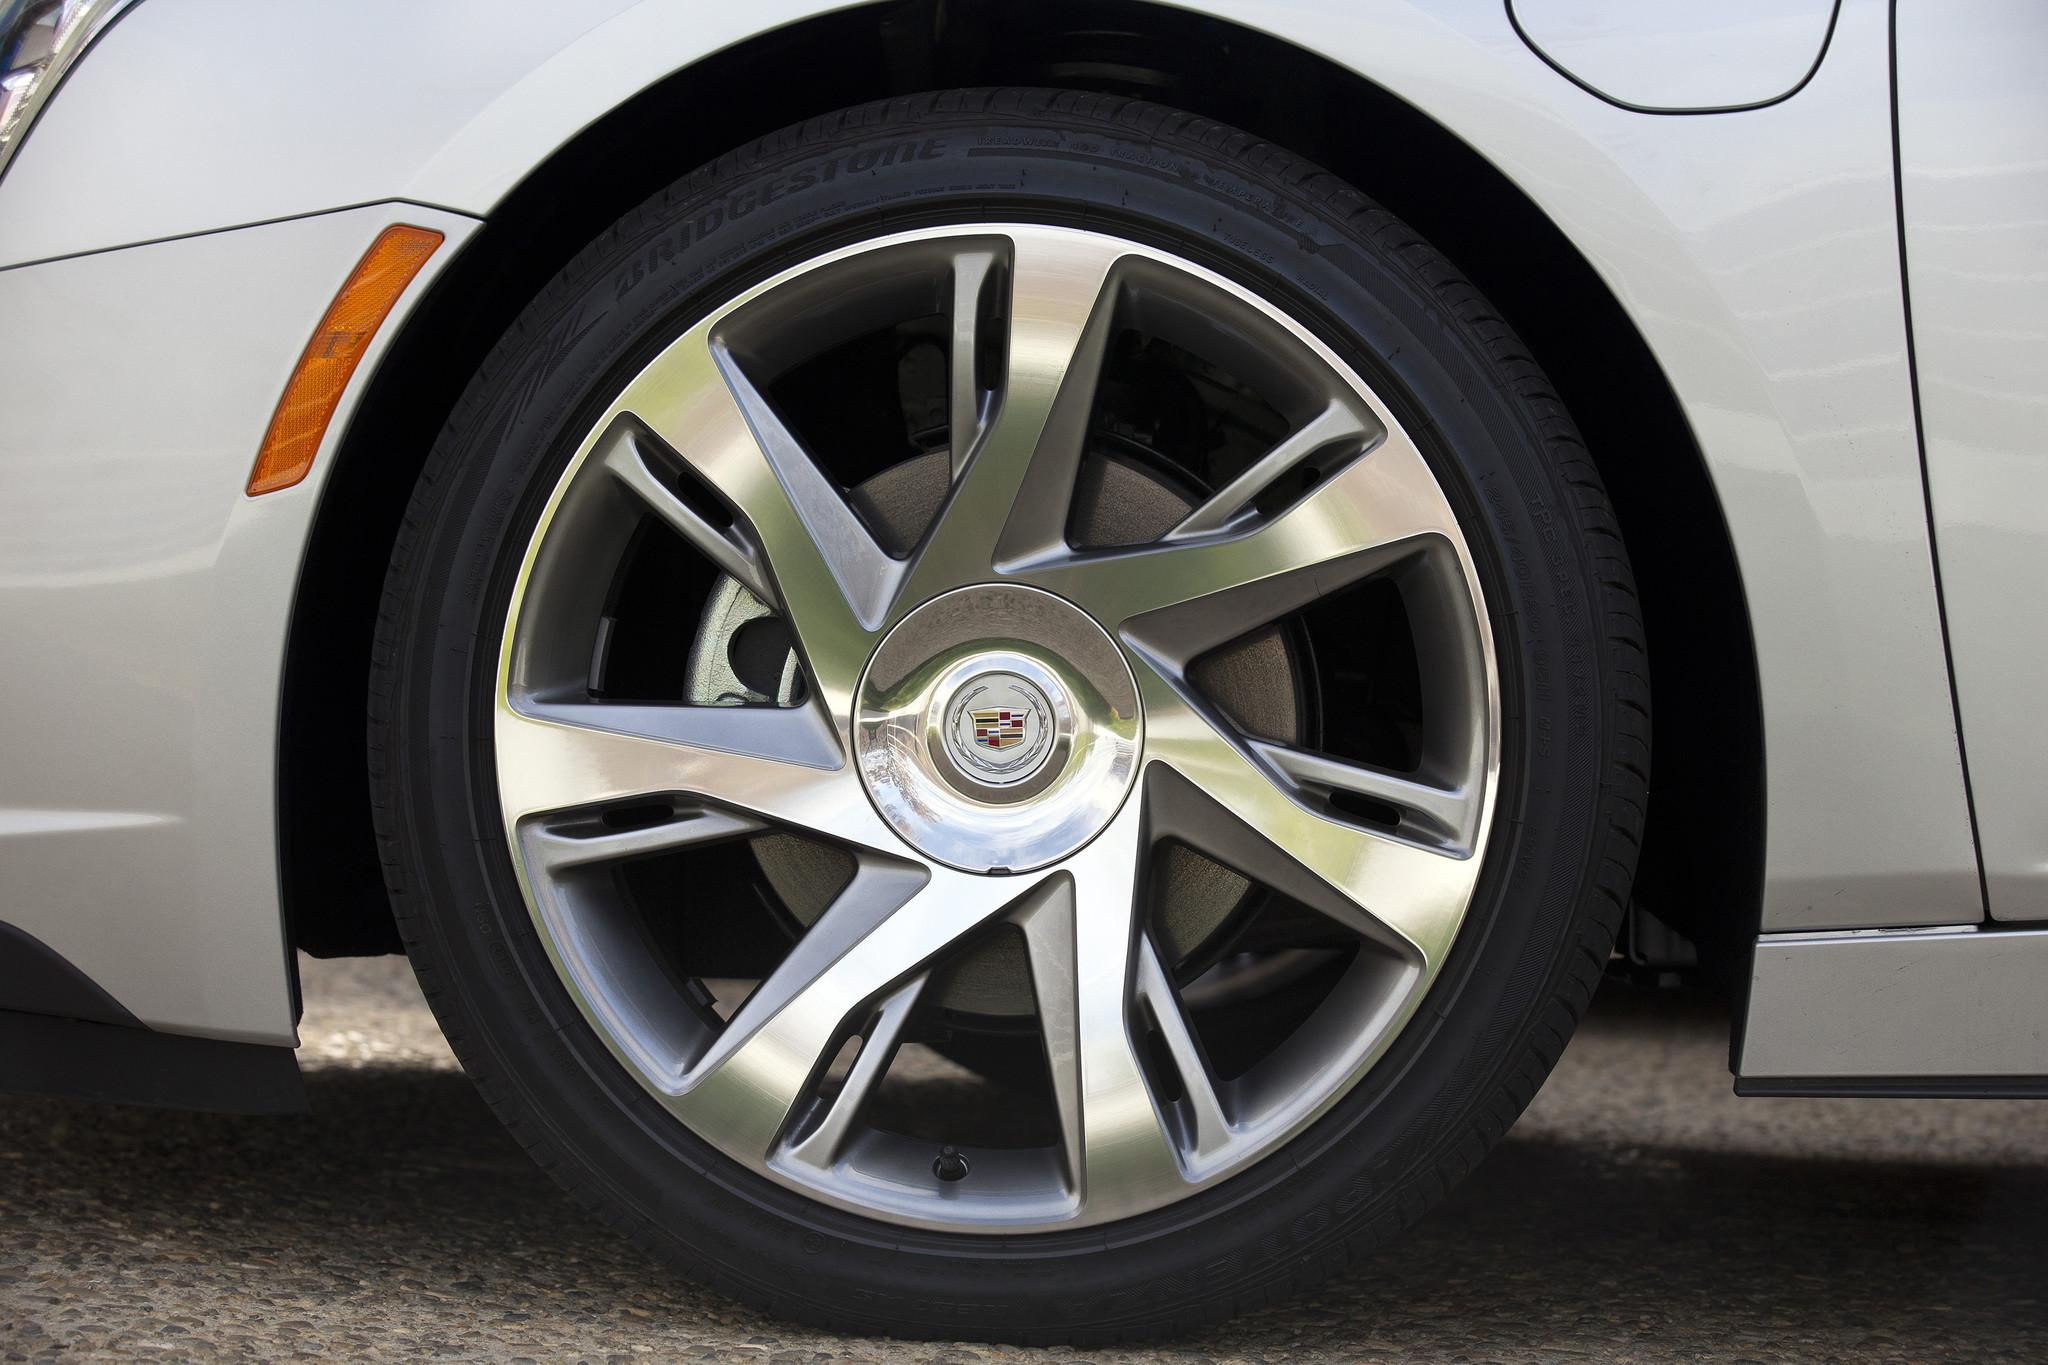 Spare tires vanishing from trunks